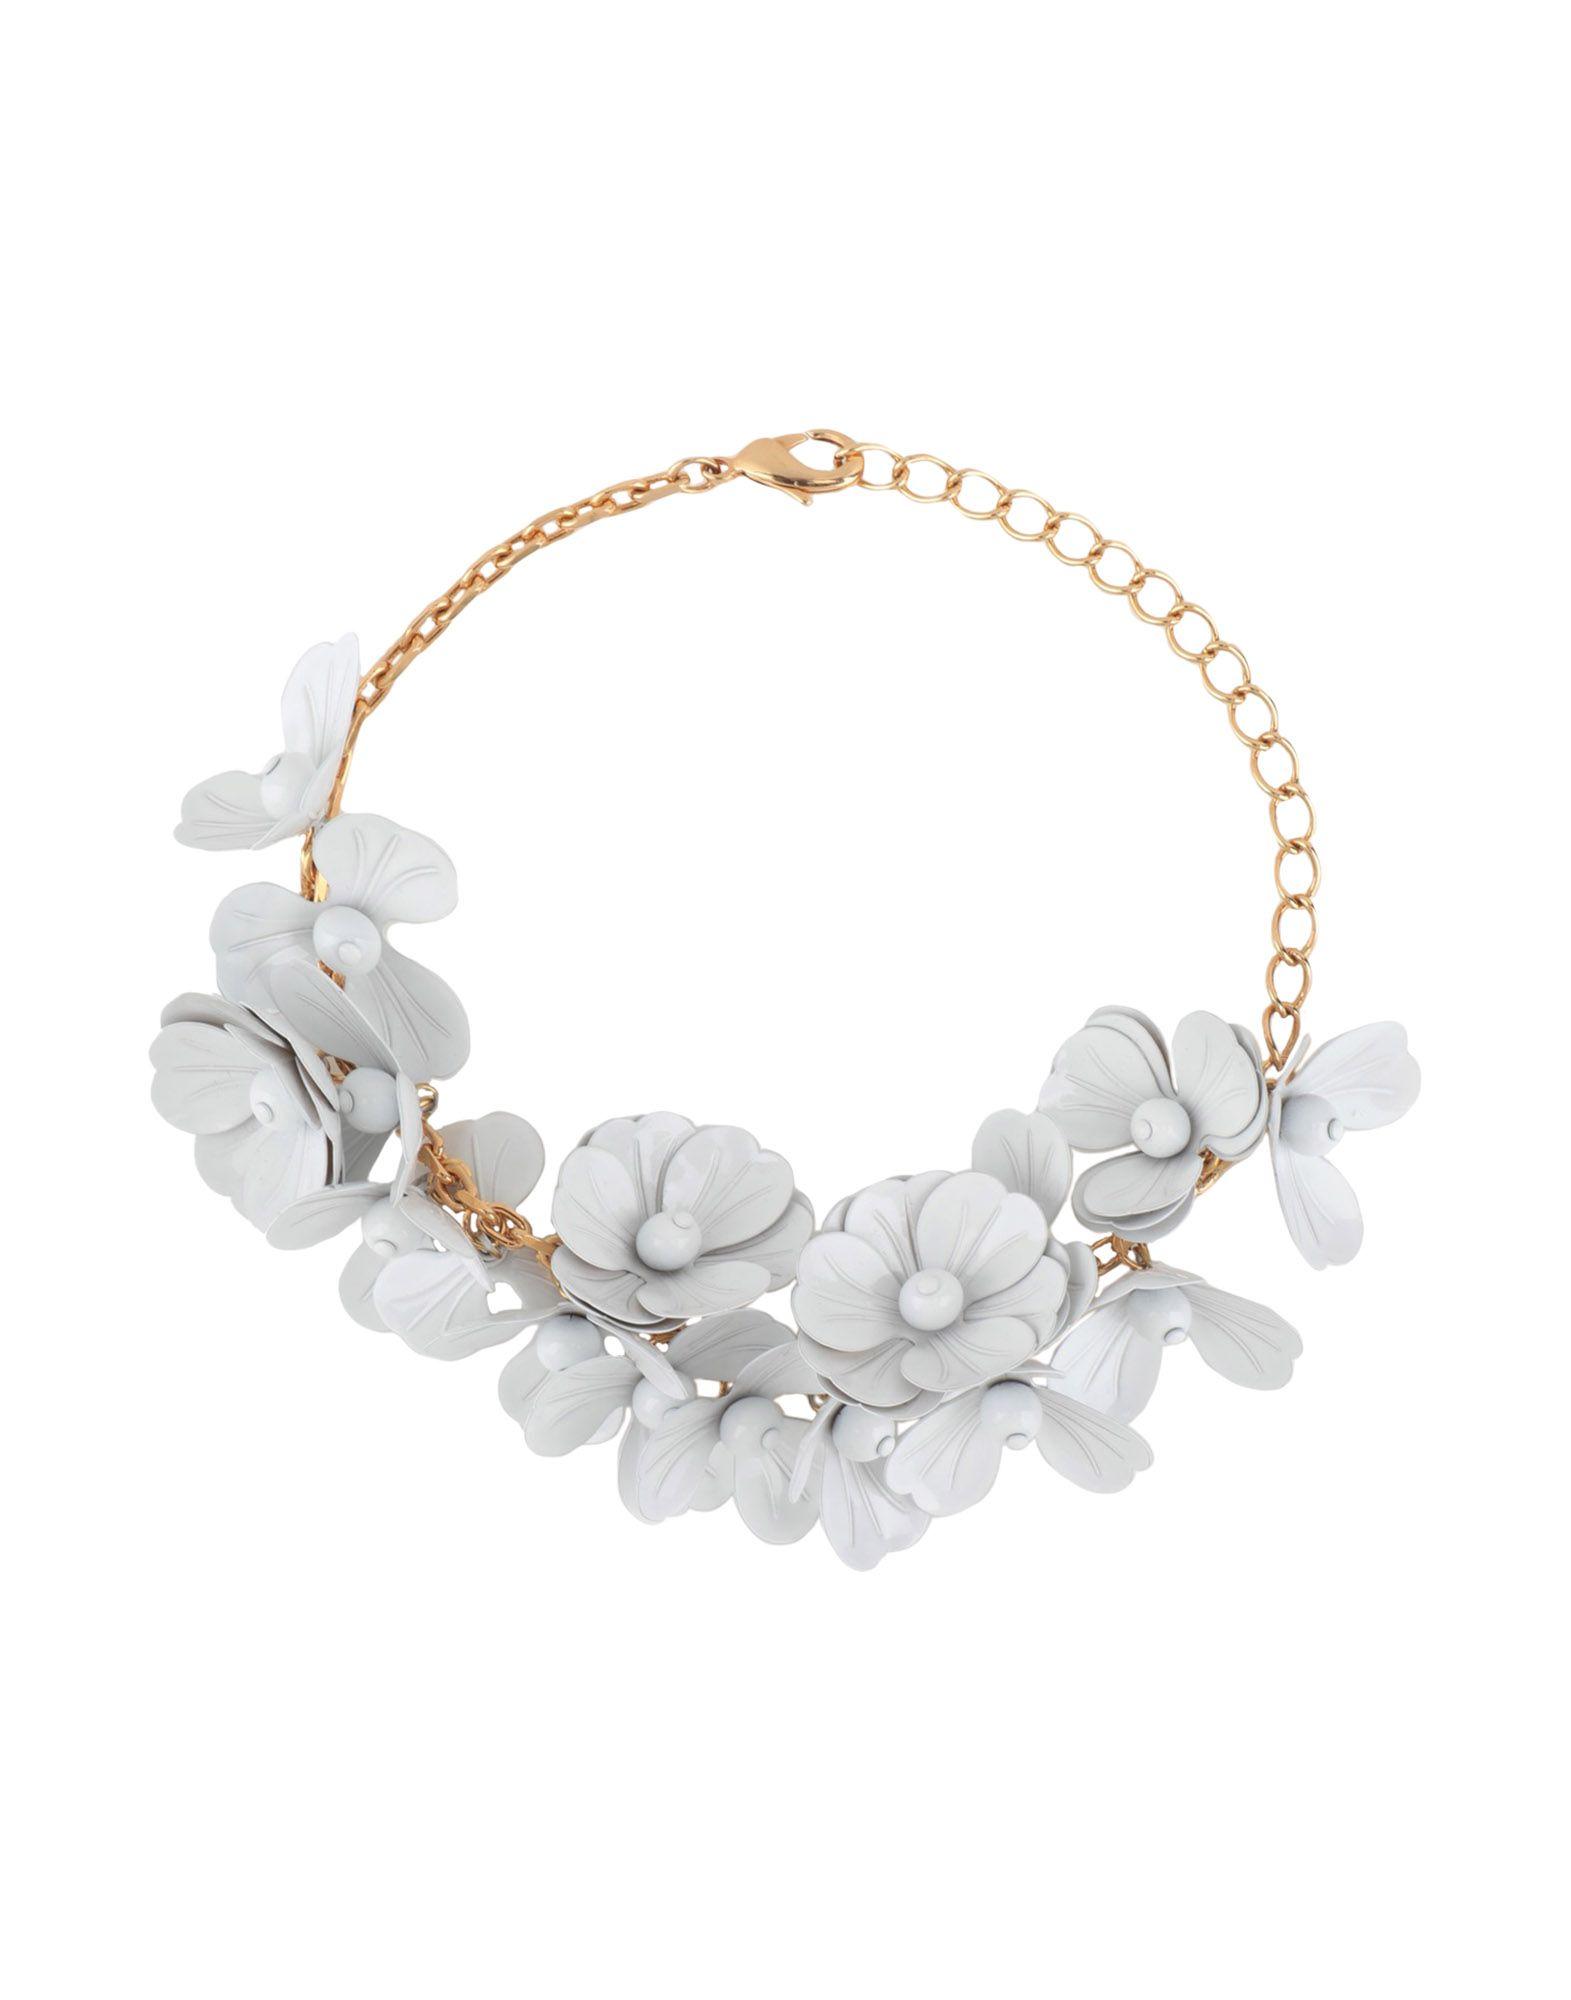 BALMAIN Necklaces. no appliqués, adjustable hook and chain fastening. 100% Brass